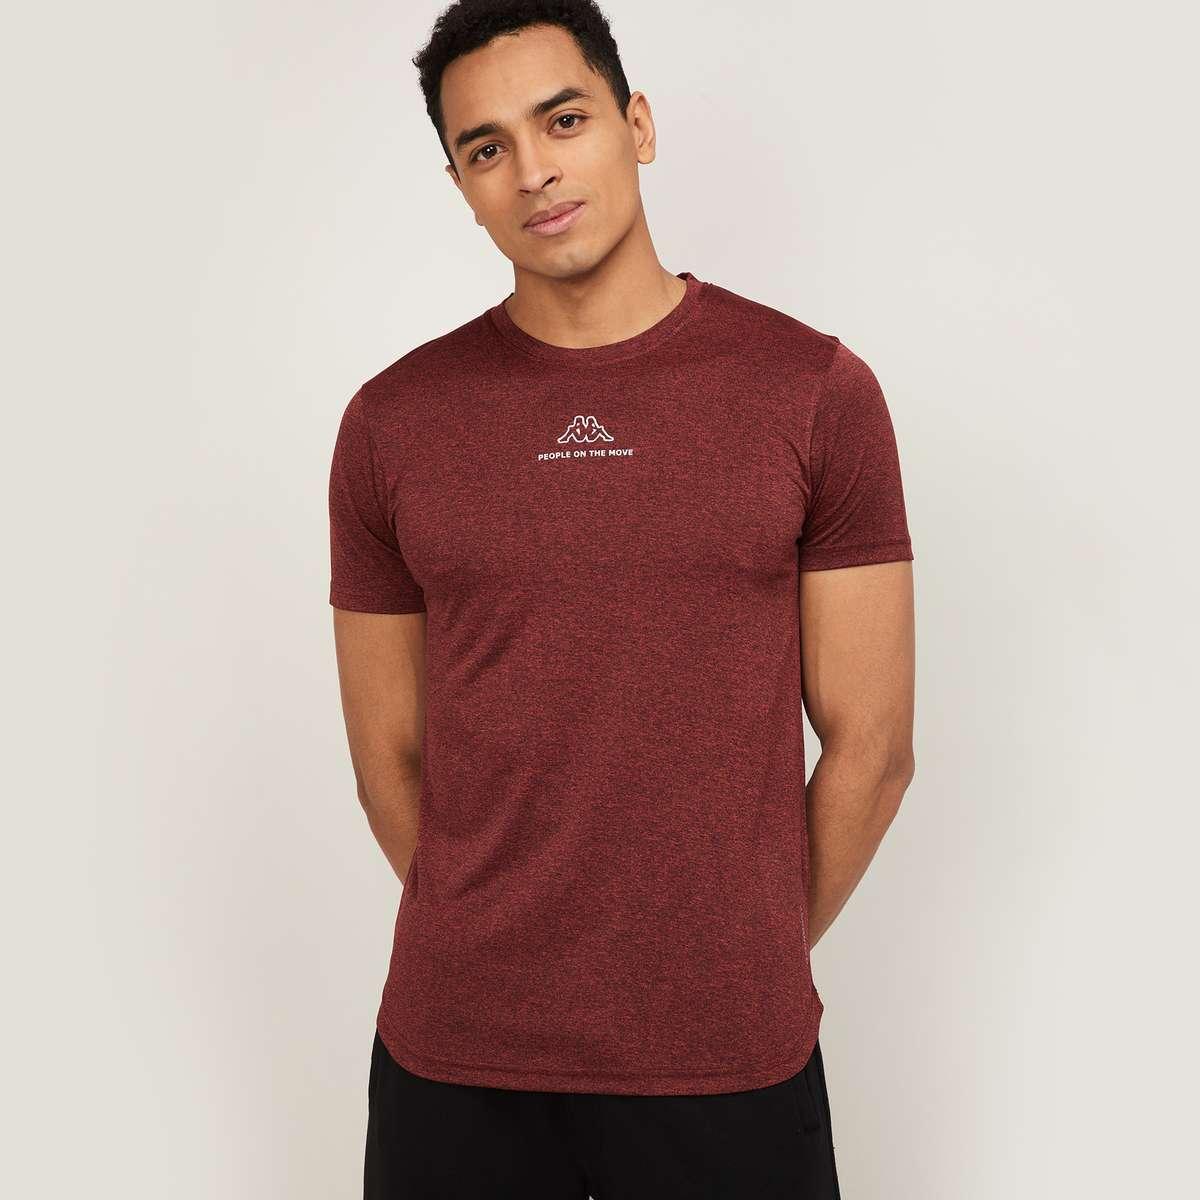 6.KAPPA Men Printed Regular Fit Sports T-shirt